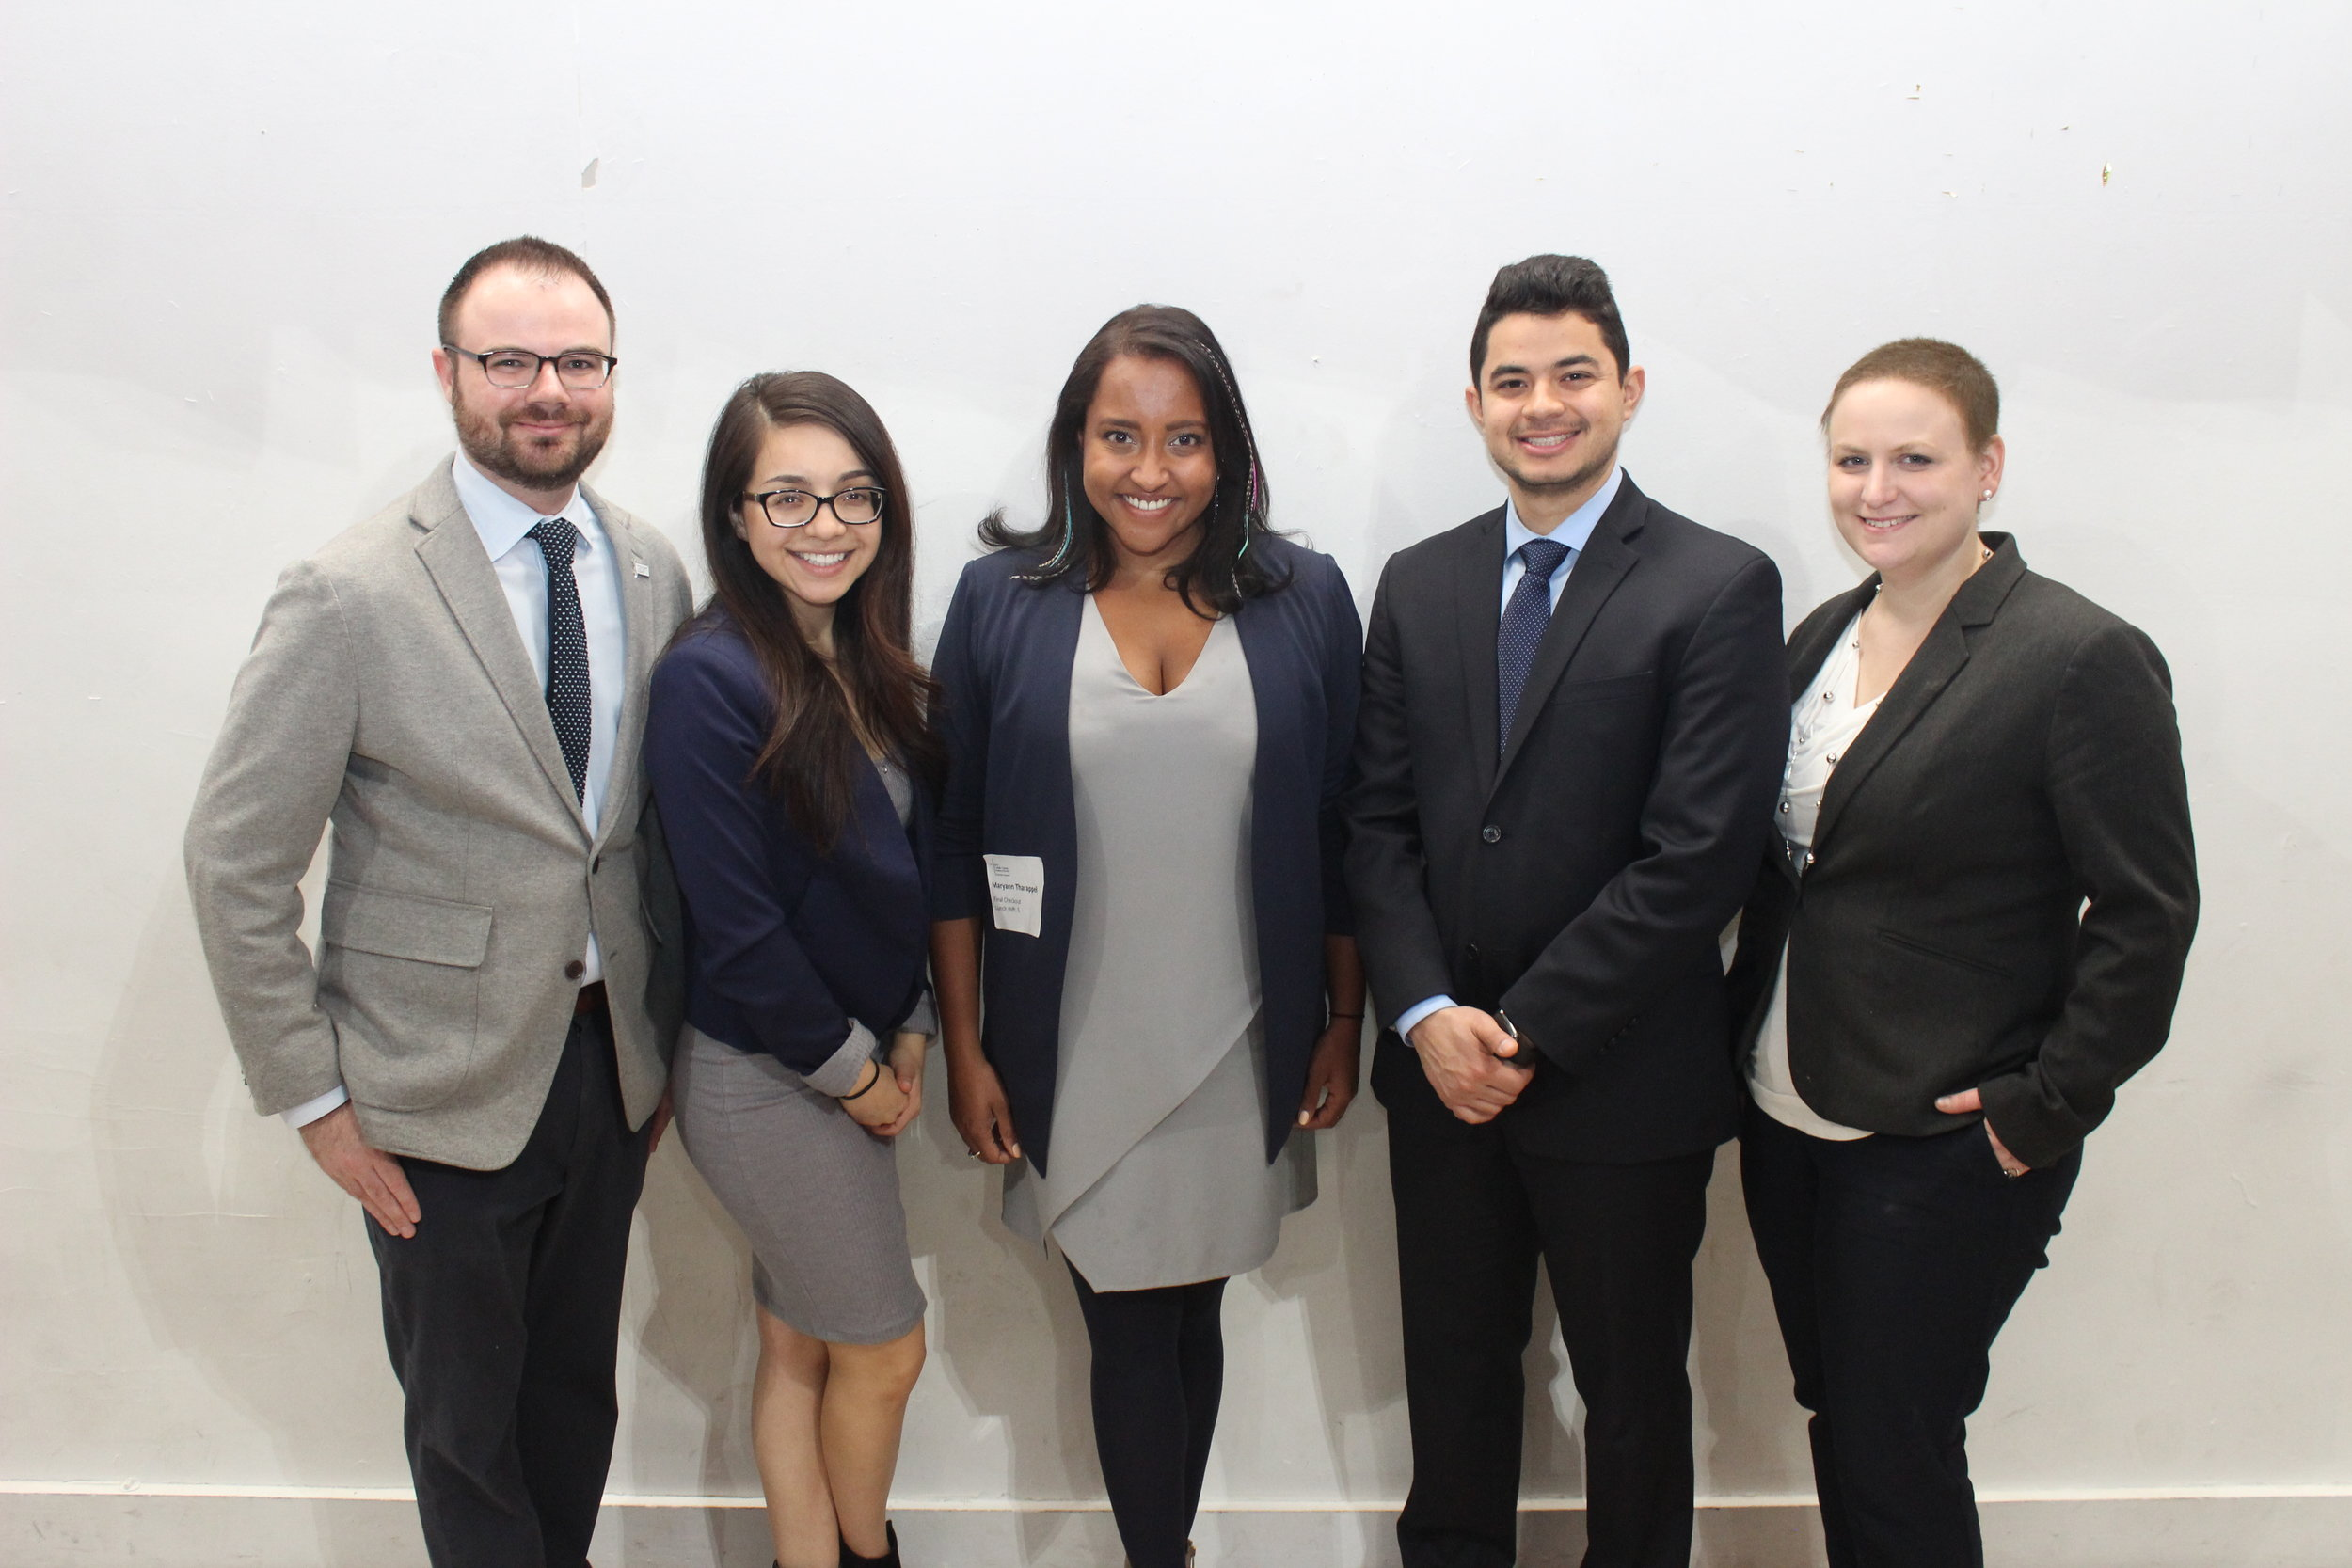 Justice Fellows L-R John Travis, Cecilia Lopez, CCCS' Maryann Tharappel, Luis Rodriguez, Sarah Burpee